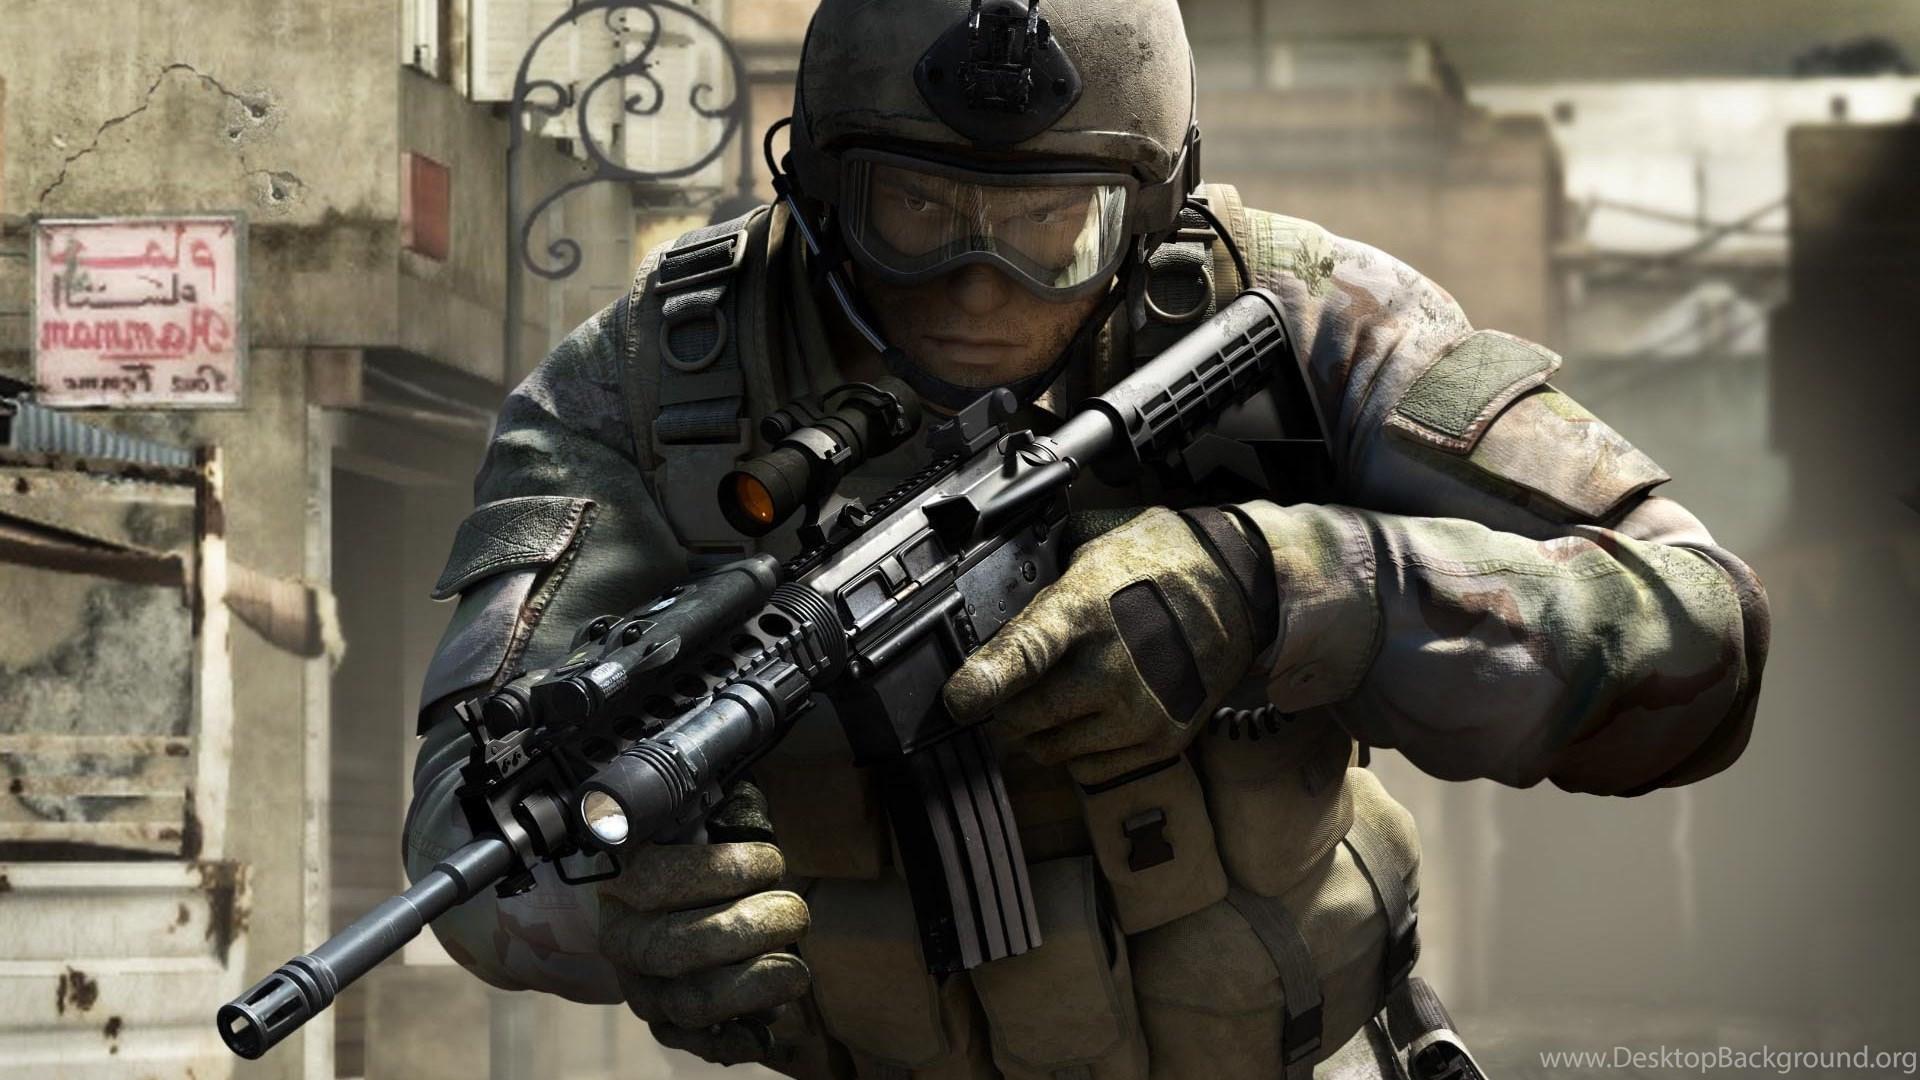 Counter Strike Hd Wallpapers Desktop Background